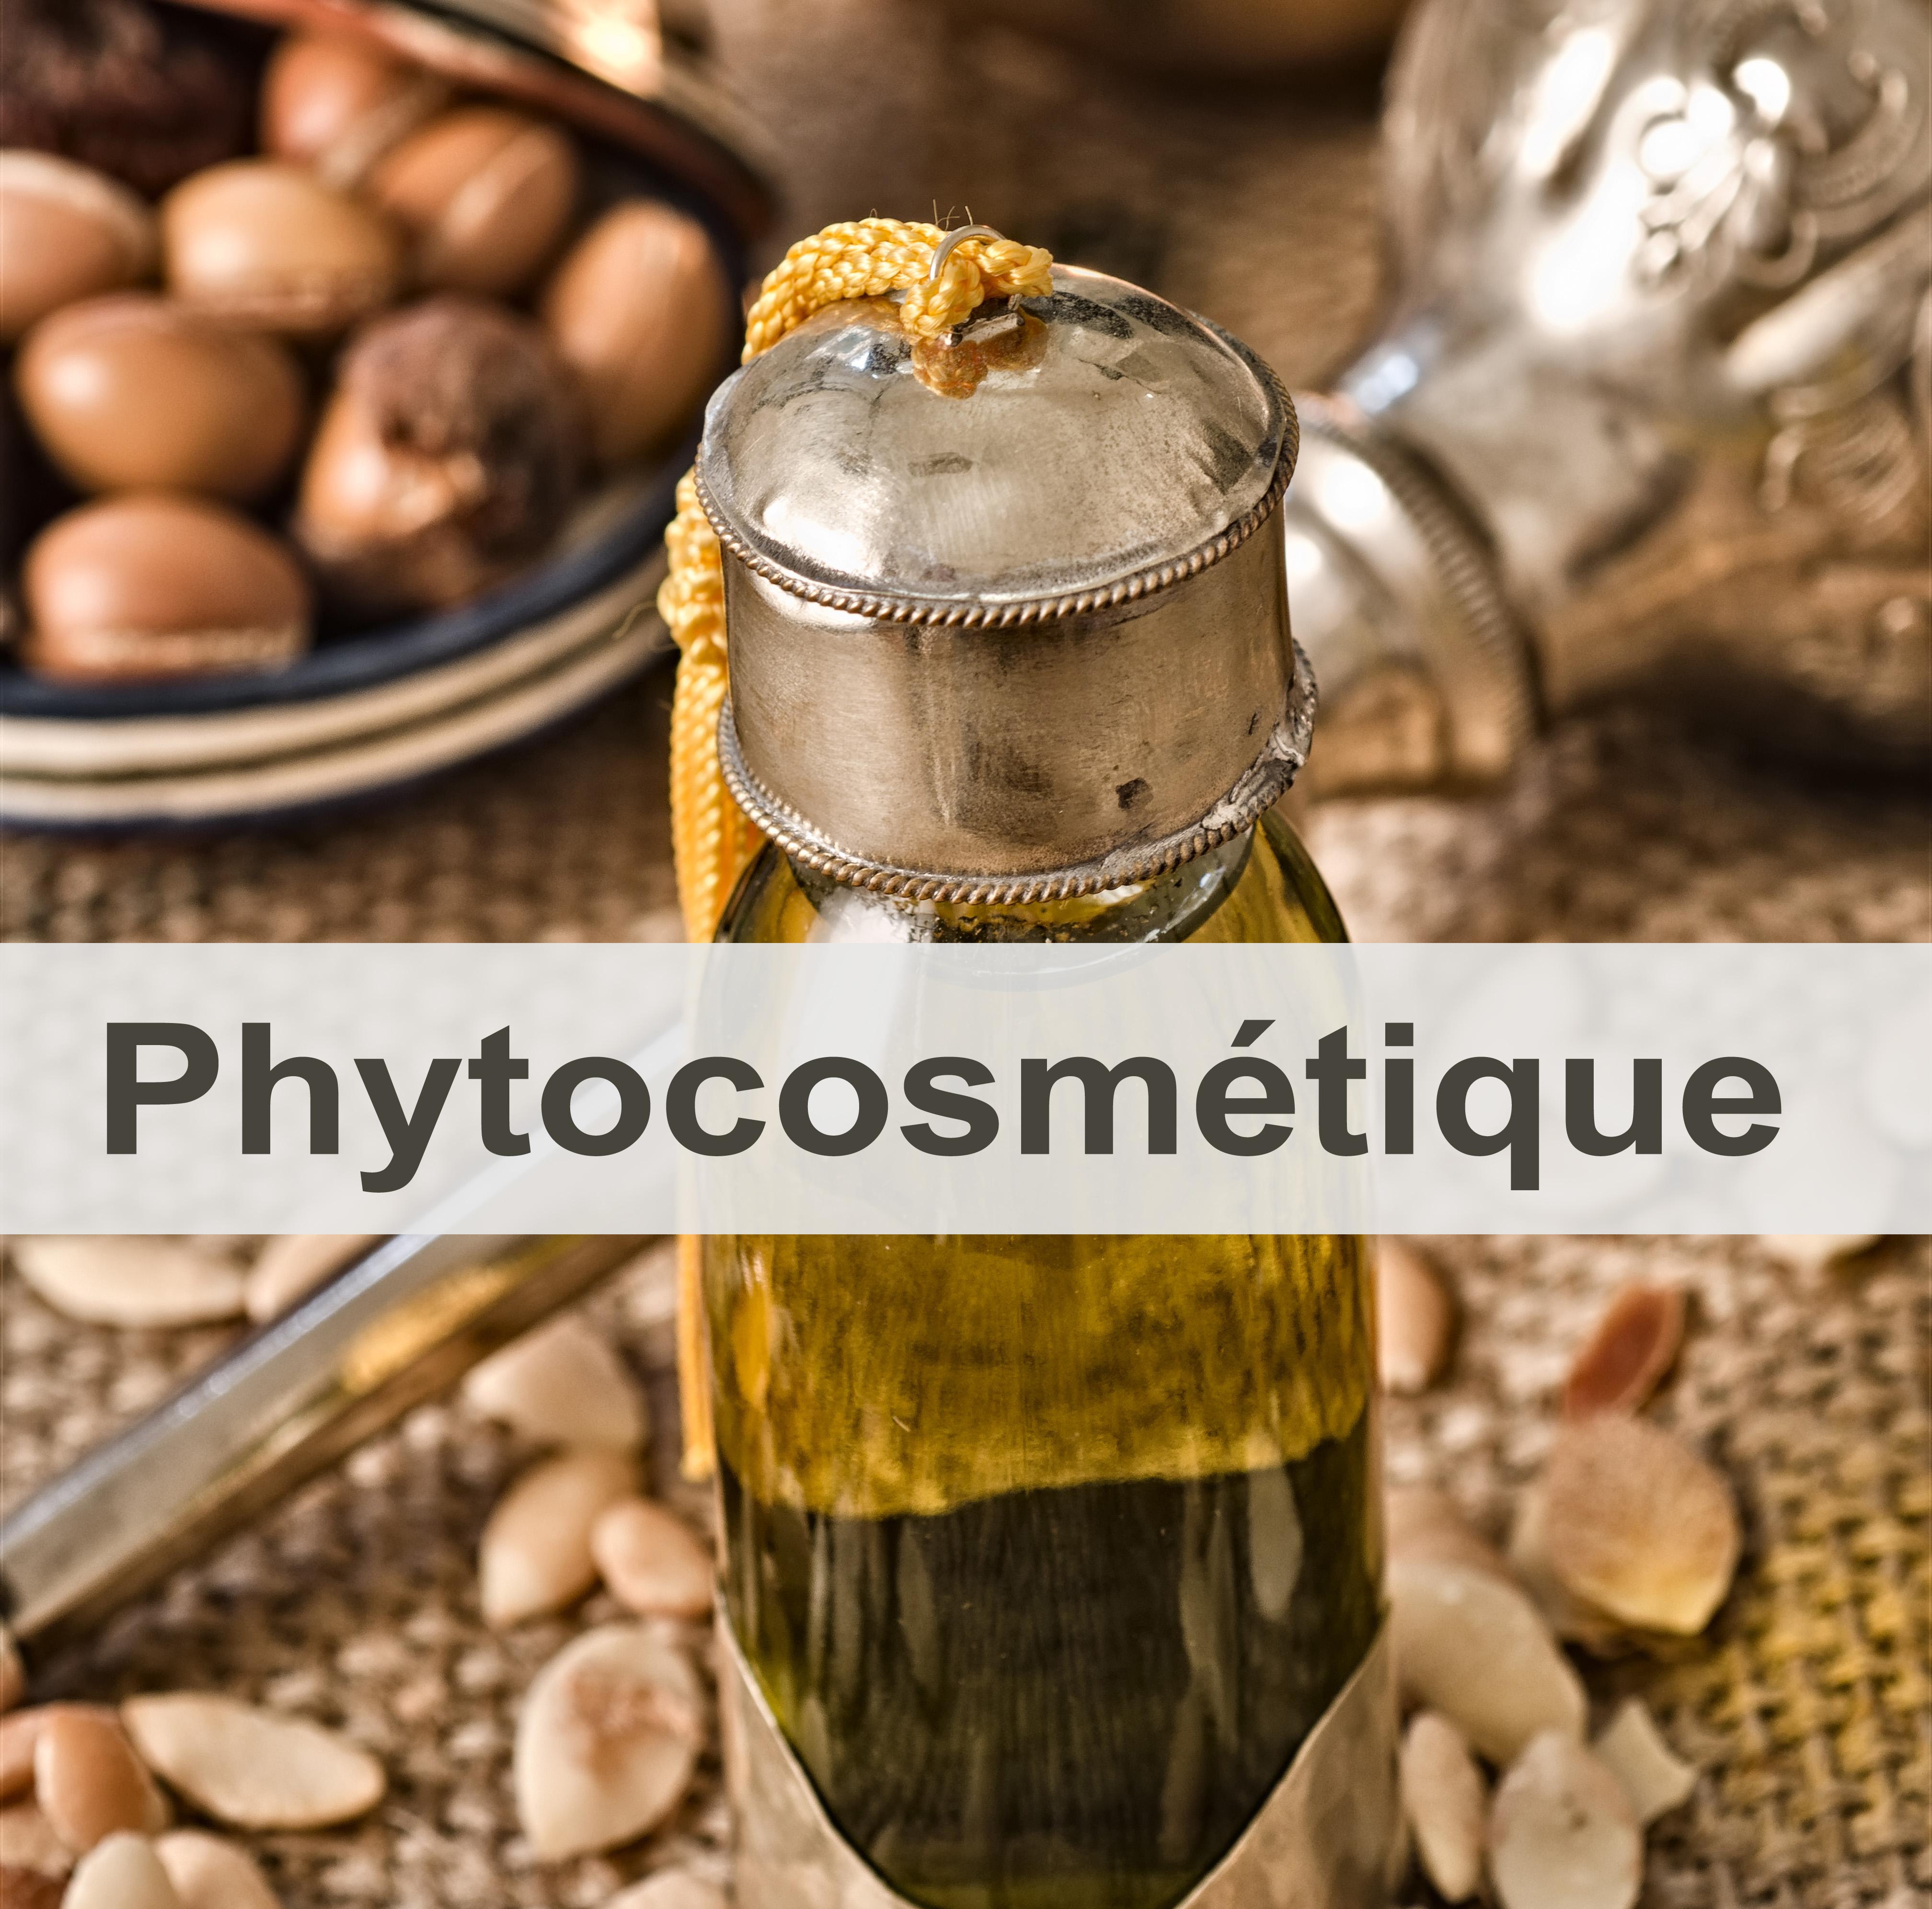 Phytocosmétique